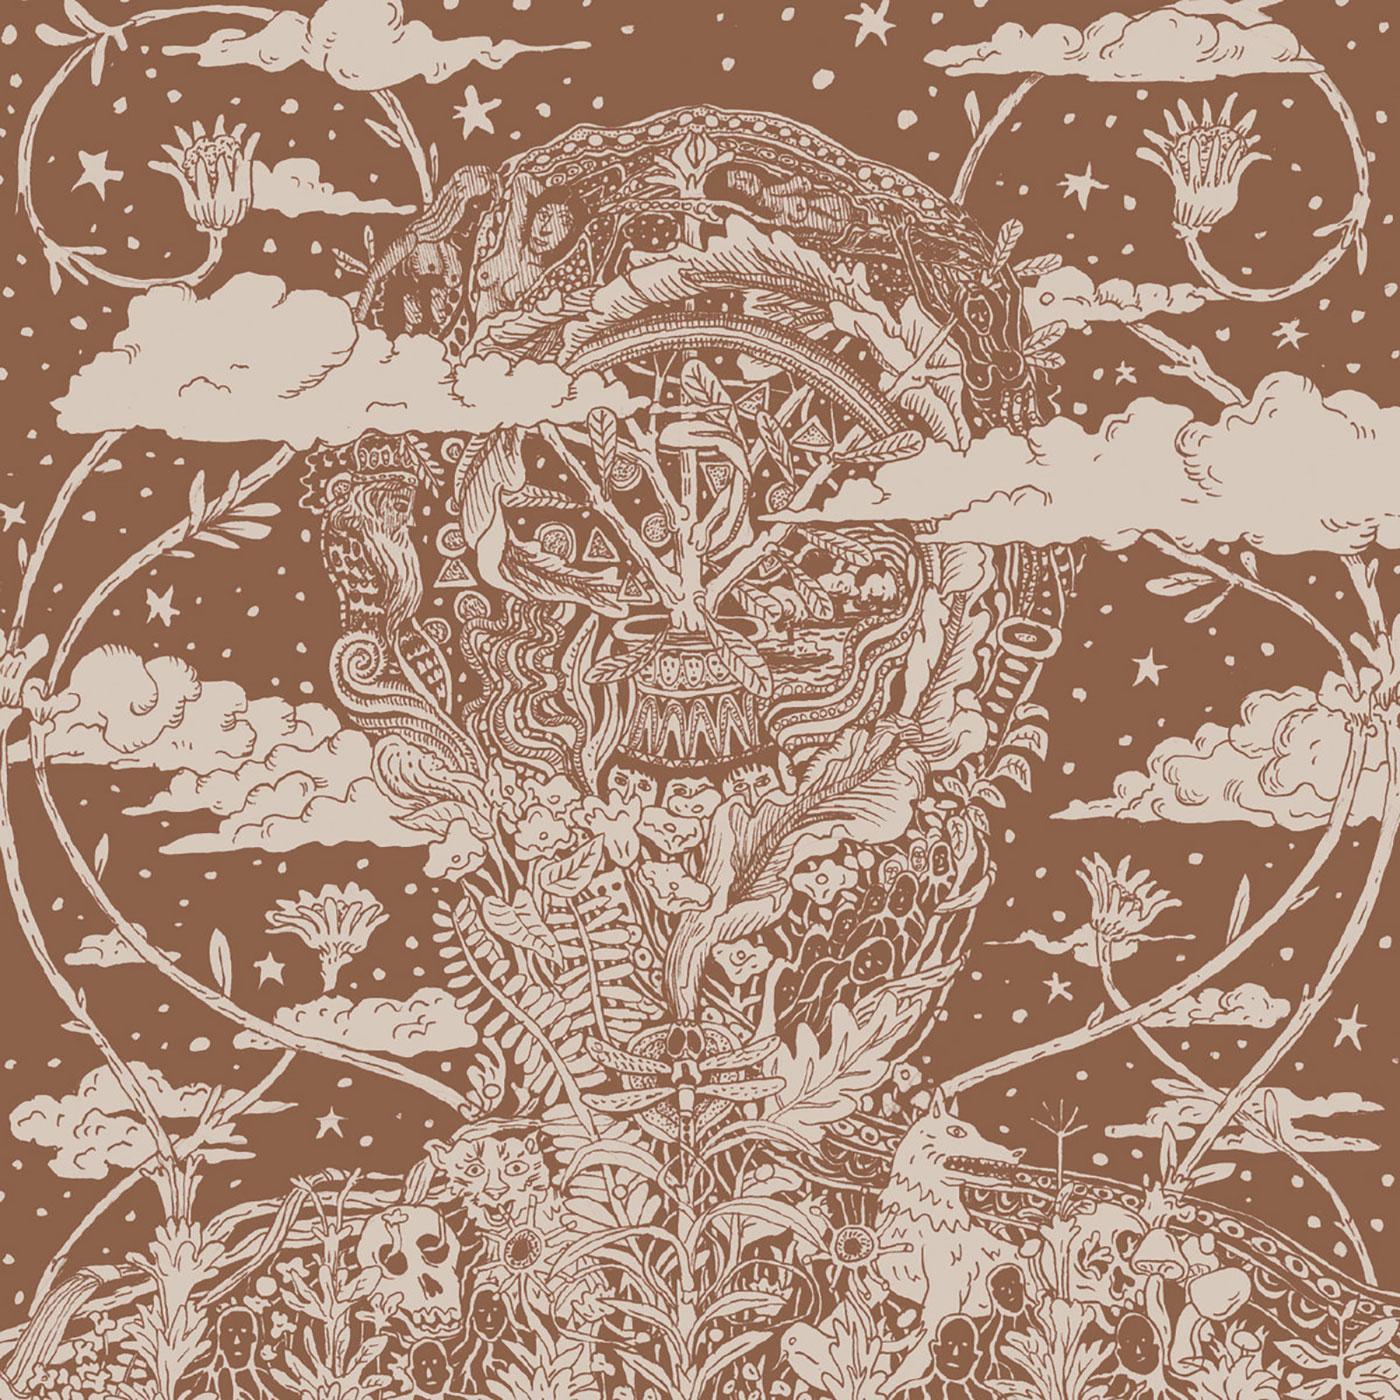 Cojones – Resonate LP (PDV Records)